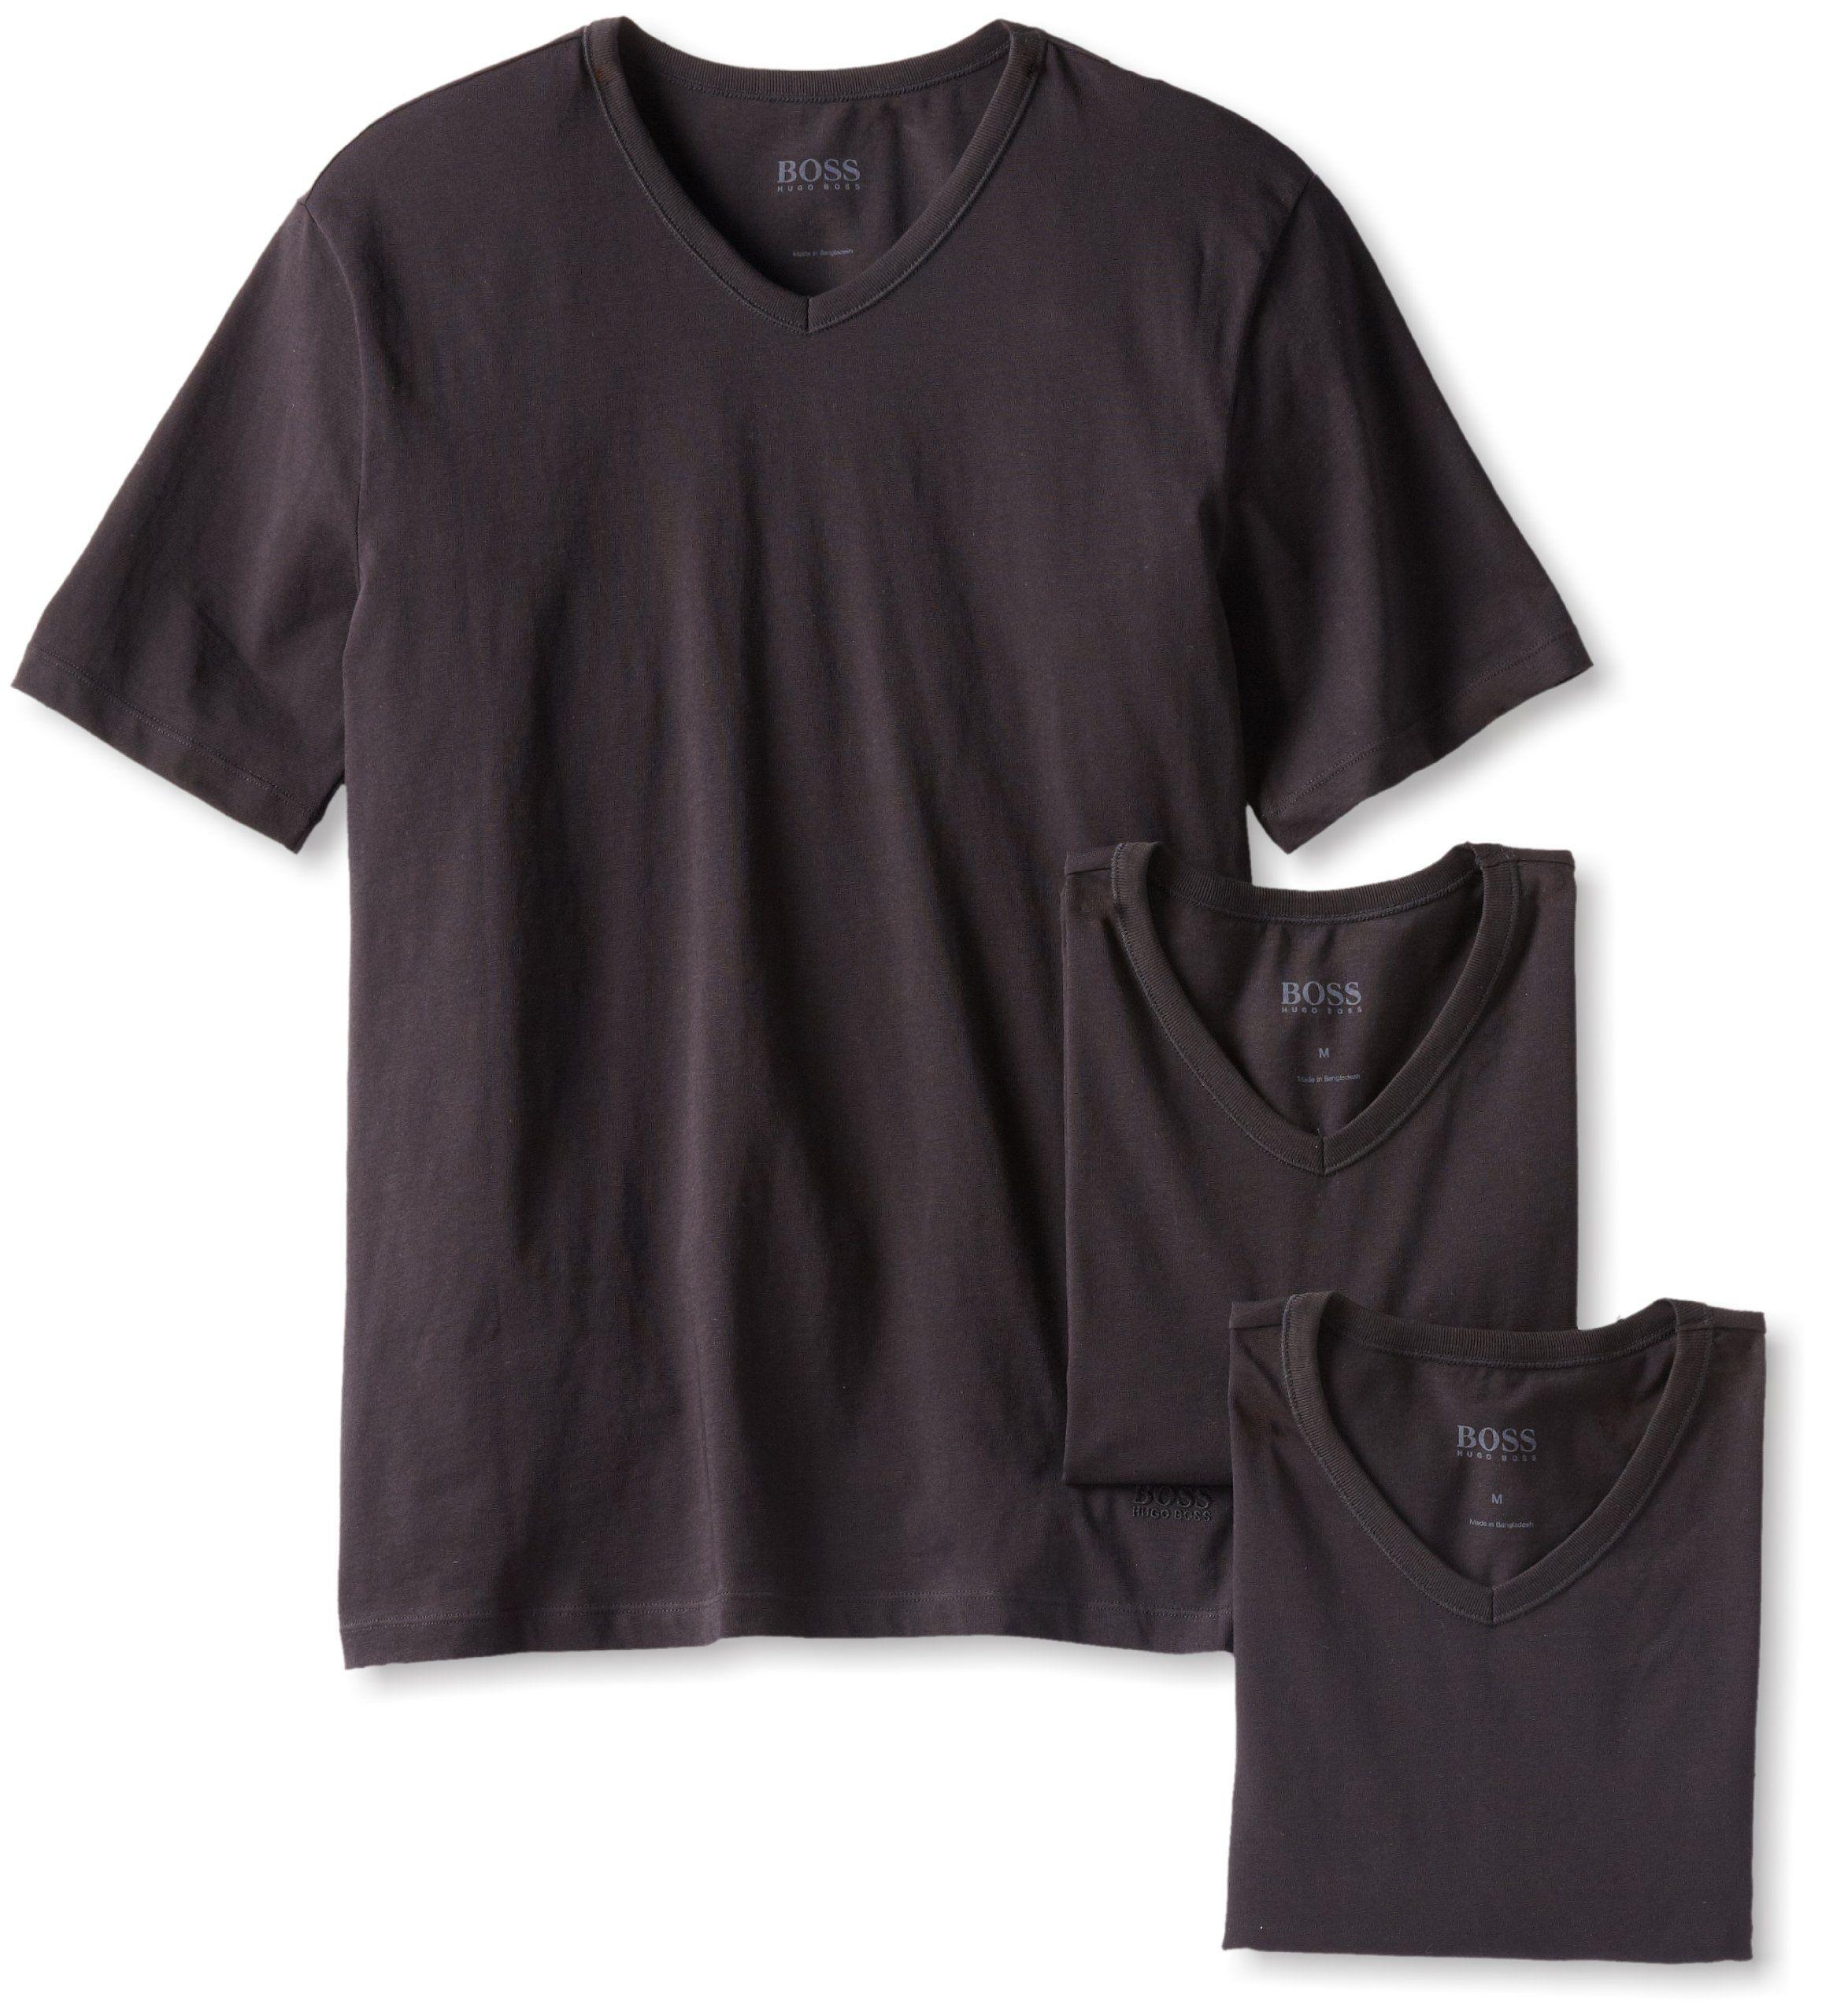 03772fc7cc4fd4 Amazon.com  BOSS HUGO BOSS Men s 3-Pack Cotton V-Neck T-Shirt  Clothing